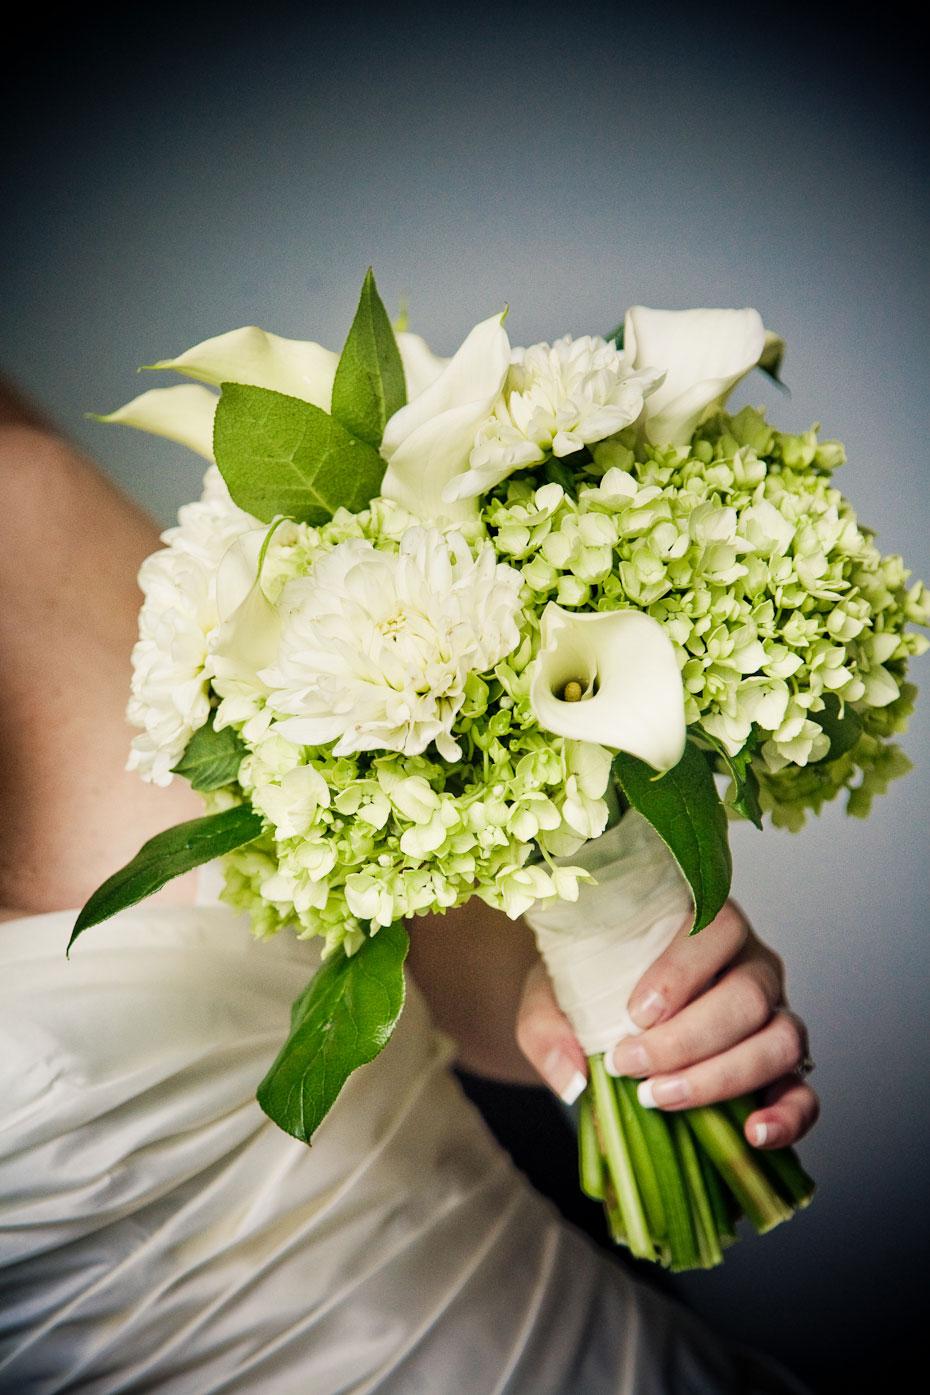 White and green bouquet hydrangeas elizabeth anne designs the white and green bouquet hydrangeas mightylinksfo Images